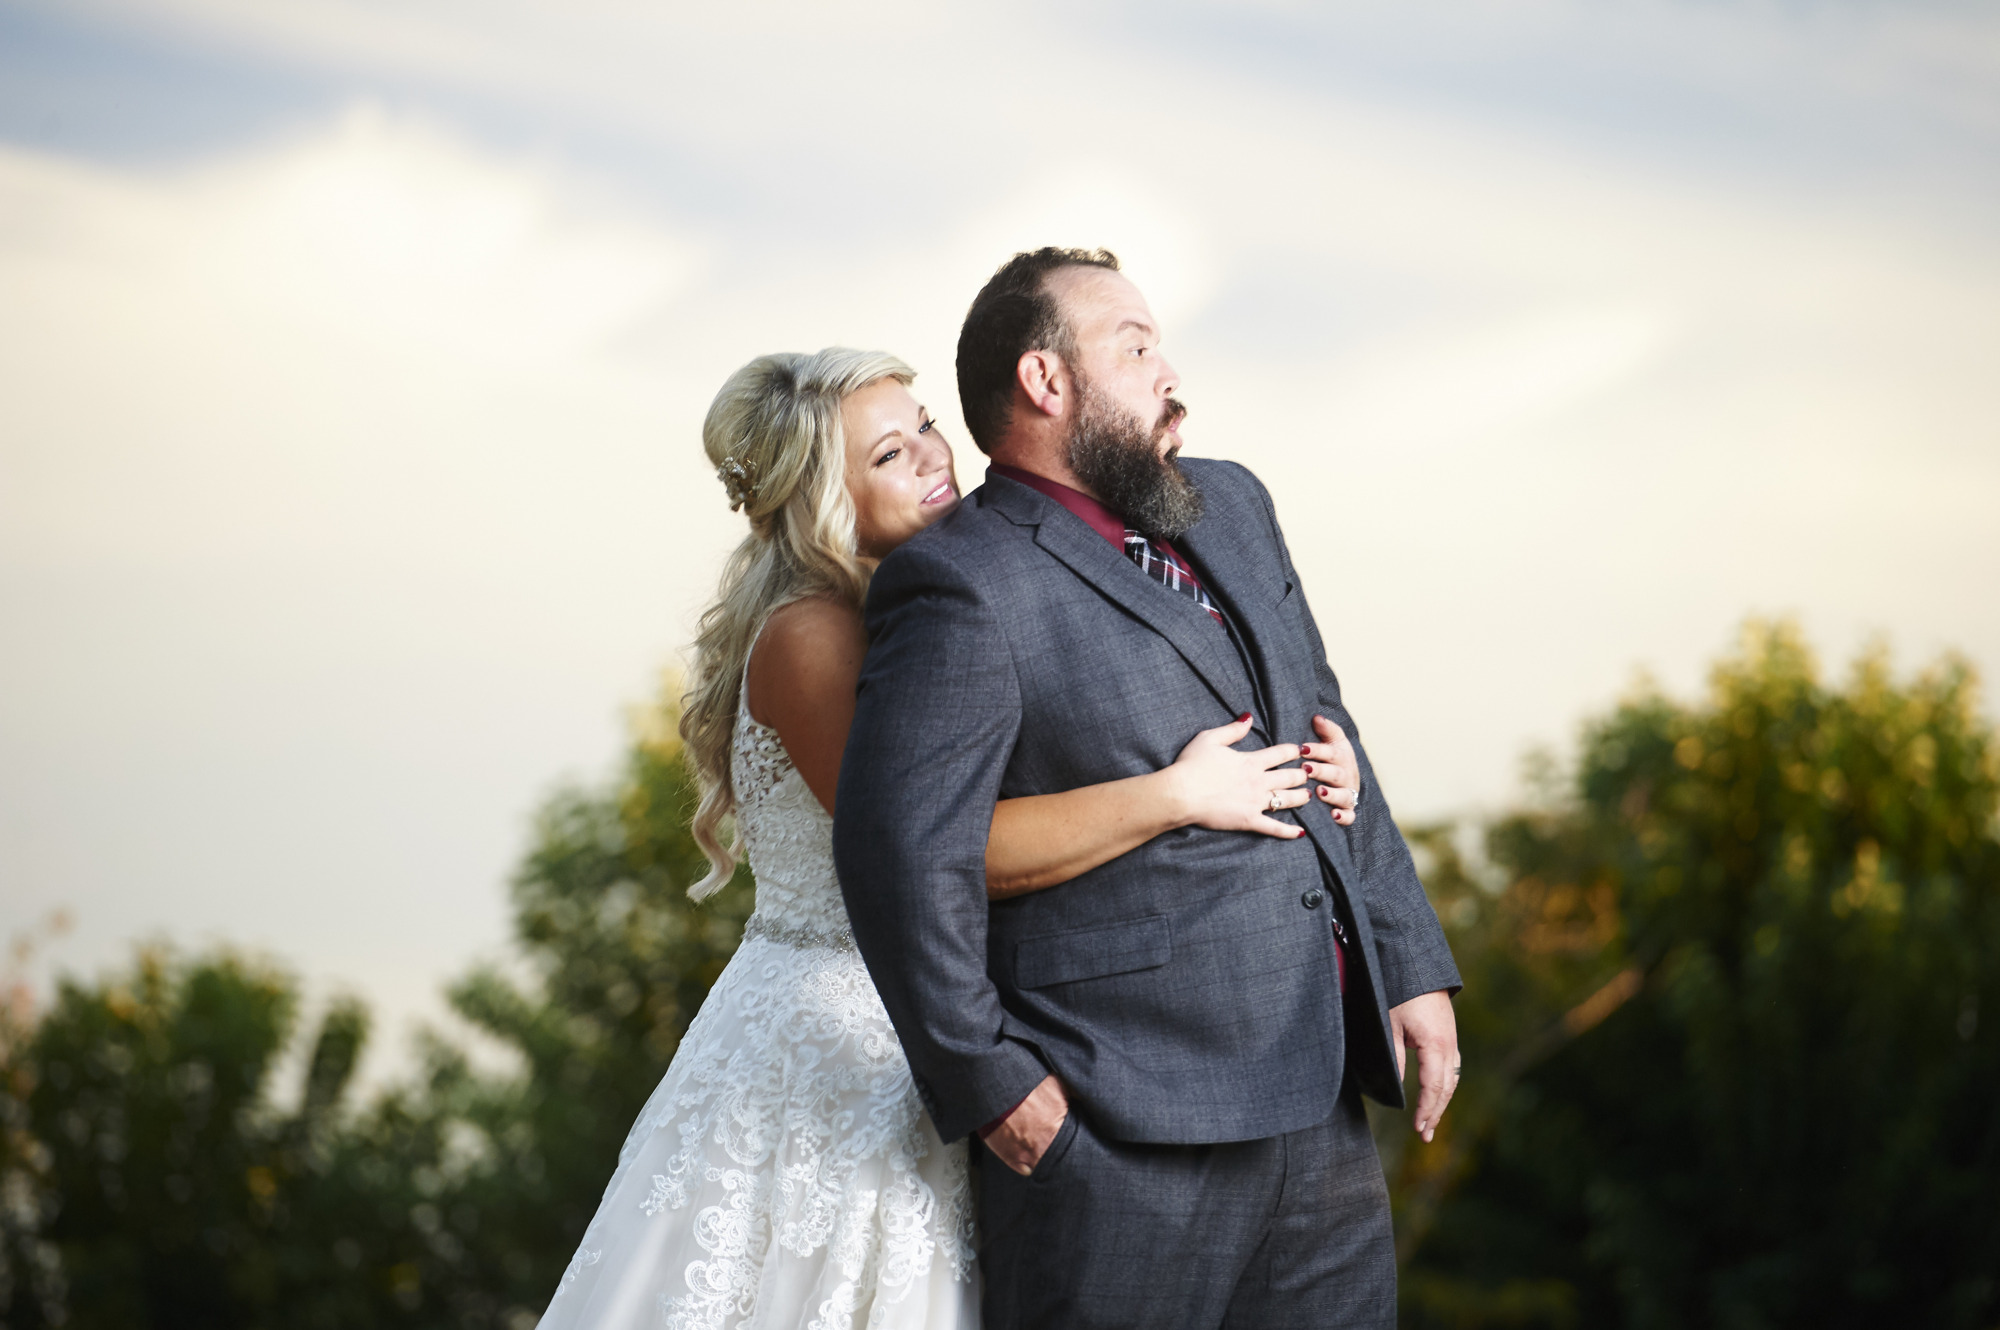 Taylor and Cody - Taylor Mansion and Crystal Ball Room - Taylor Texas - Wedding - 032